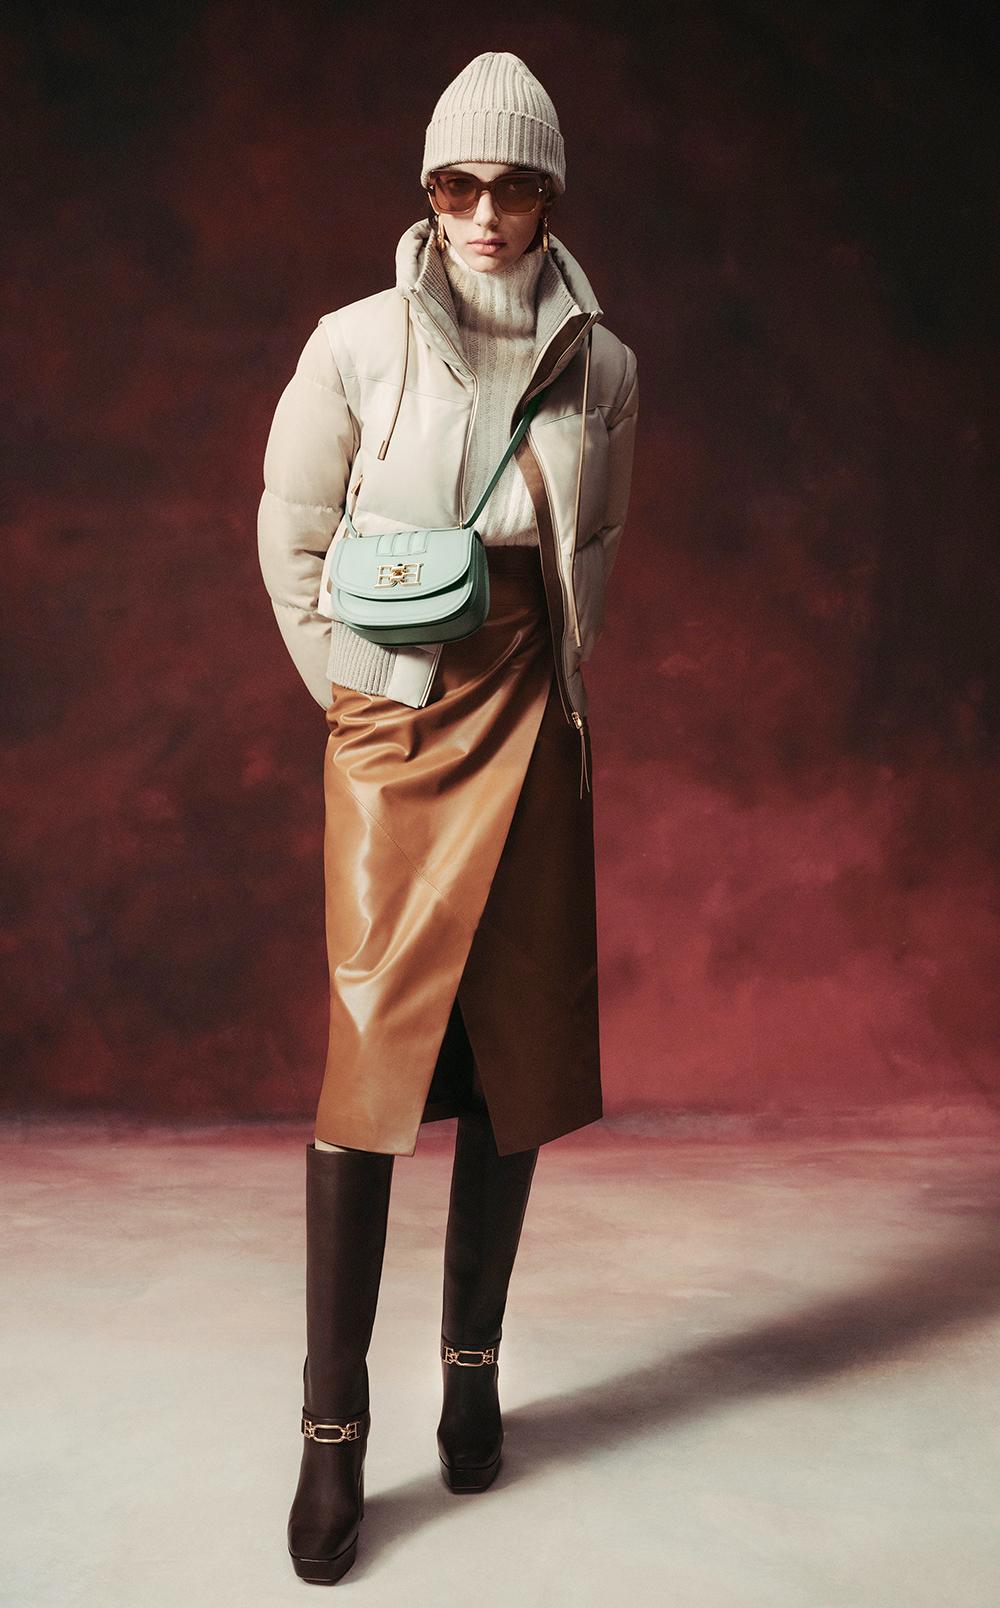 Best MFW Looks I Bally Fall 2021 Collection #fashionblog #milanfashionweek #fashionstyle #falloutfits